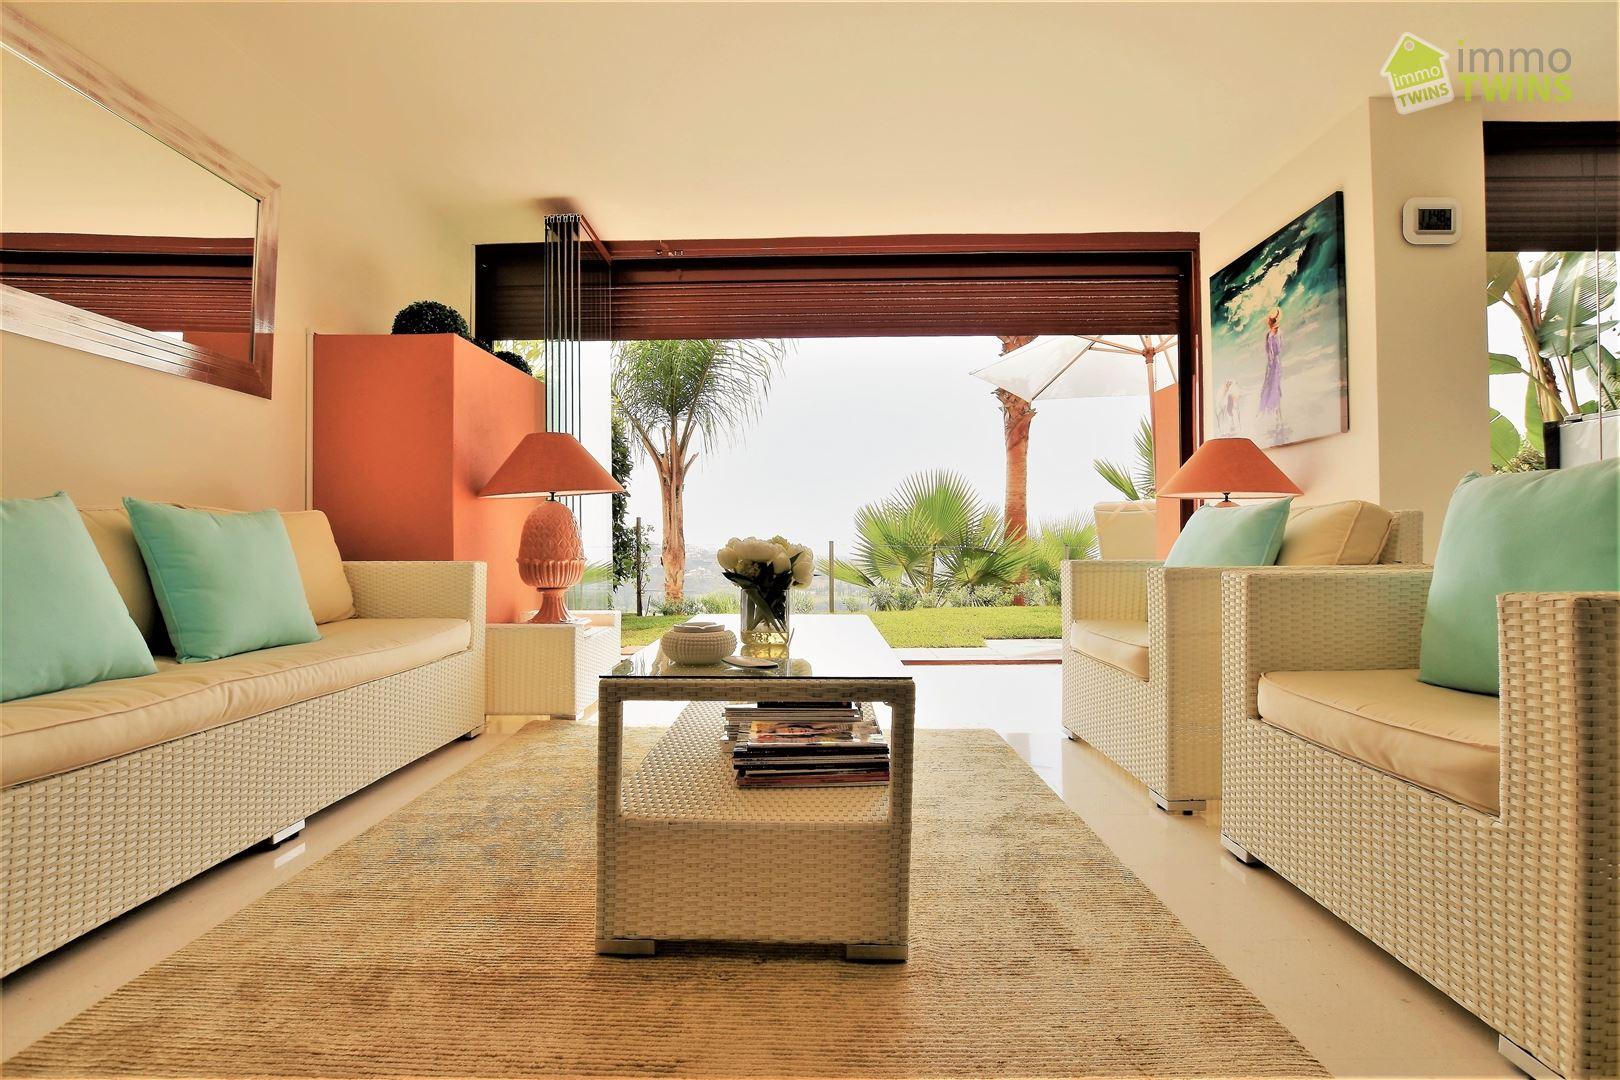 Foto 8 : Appartement te 29679 MARBELLA (Spanje) - Prijs € 485.000